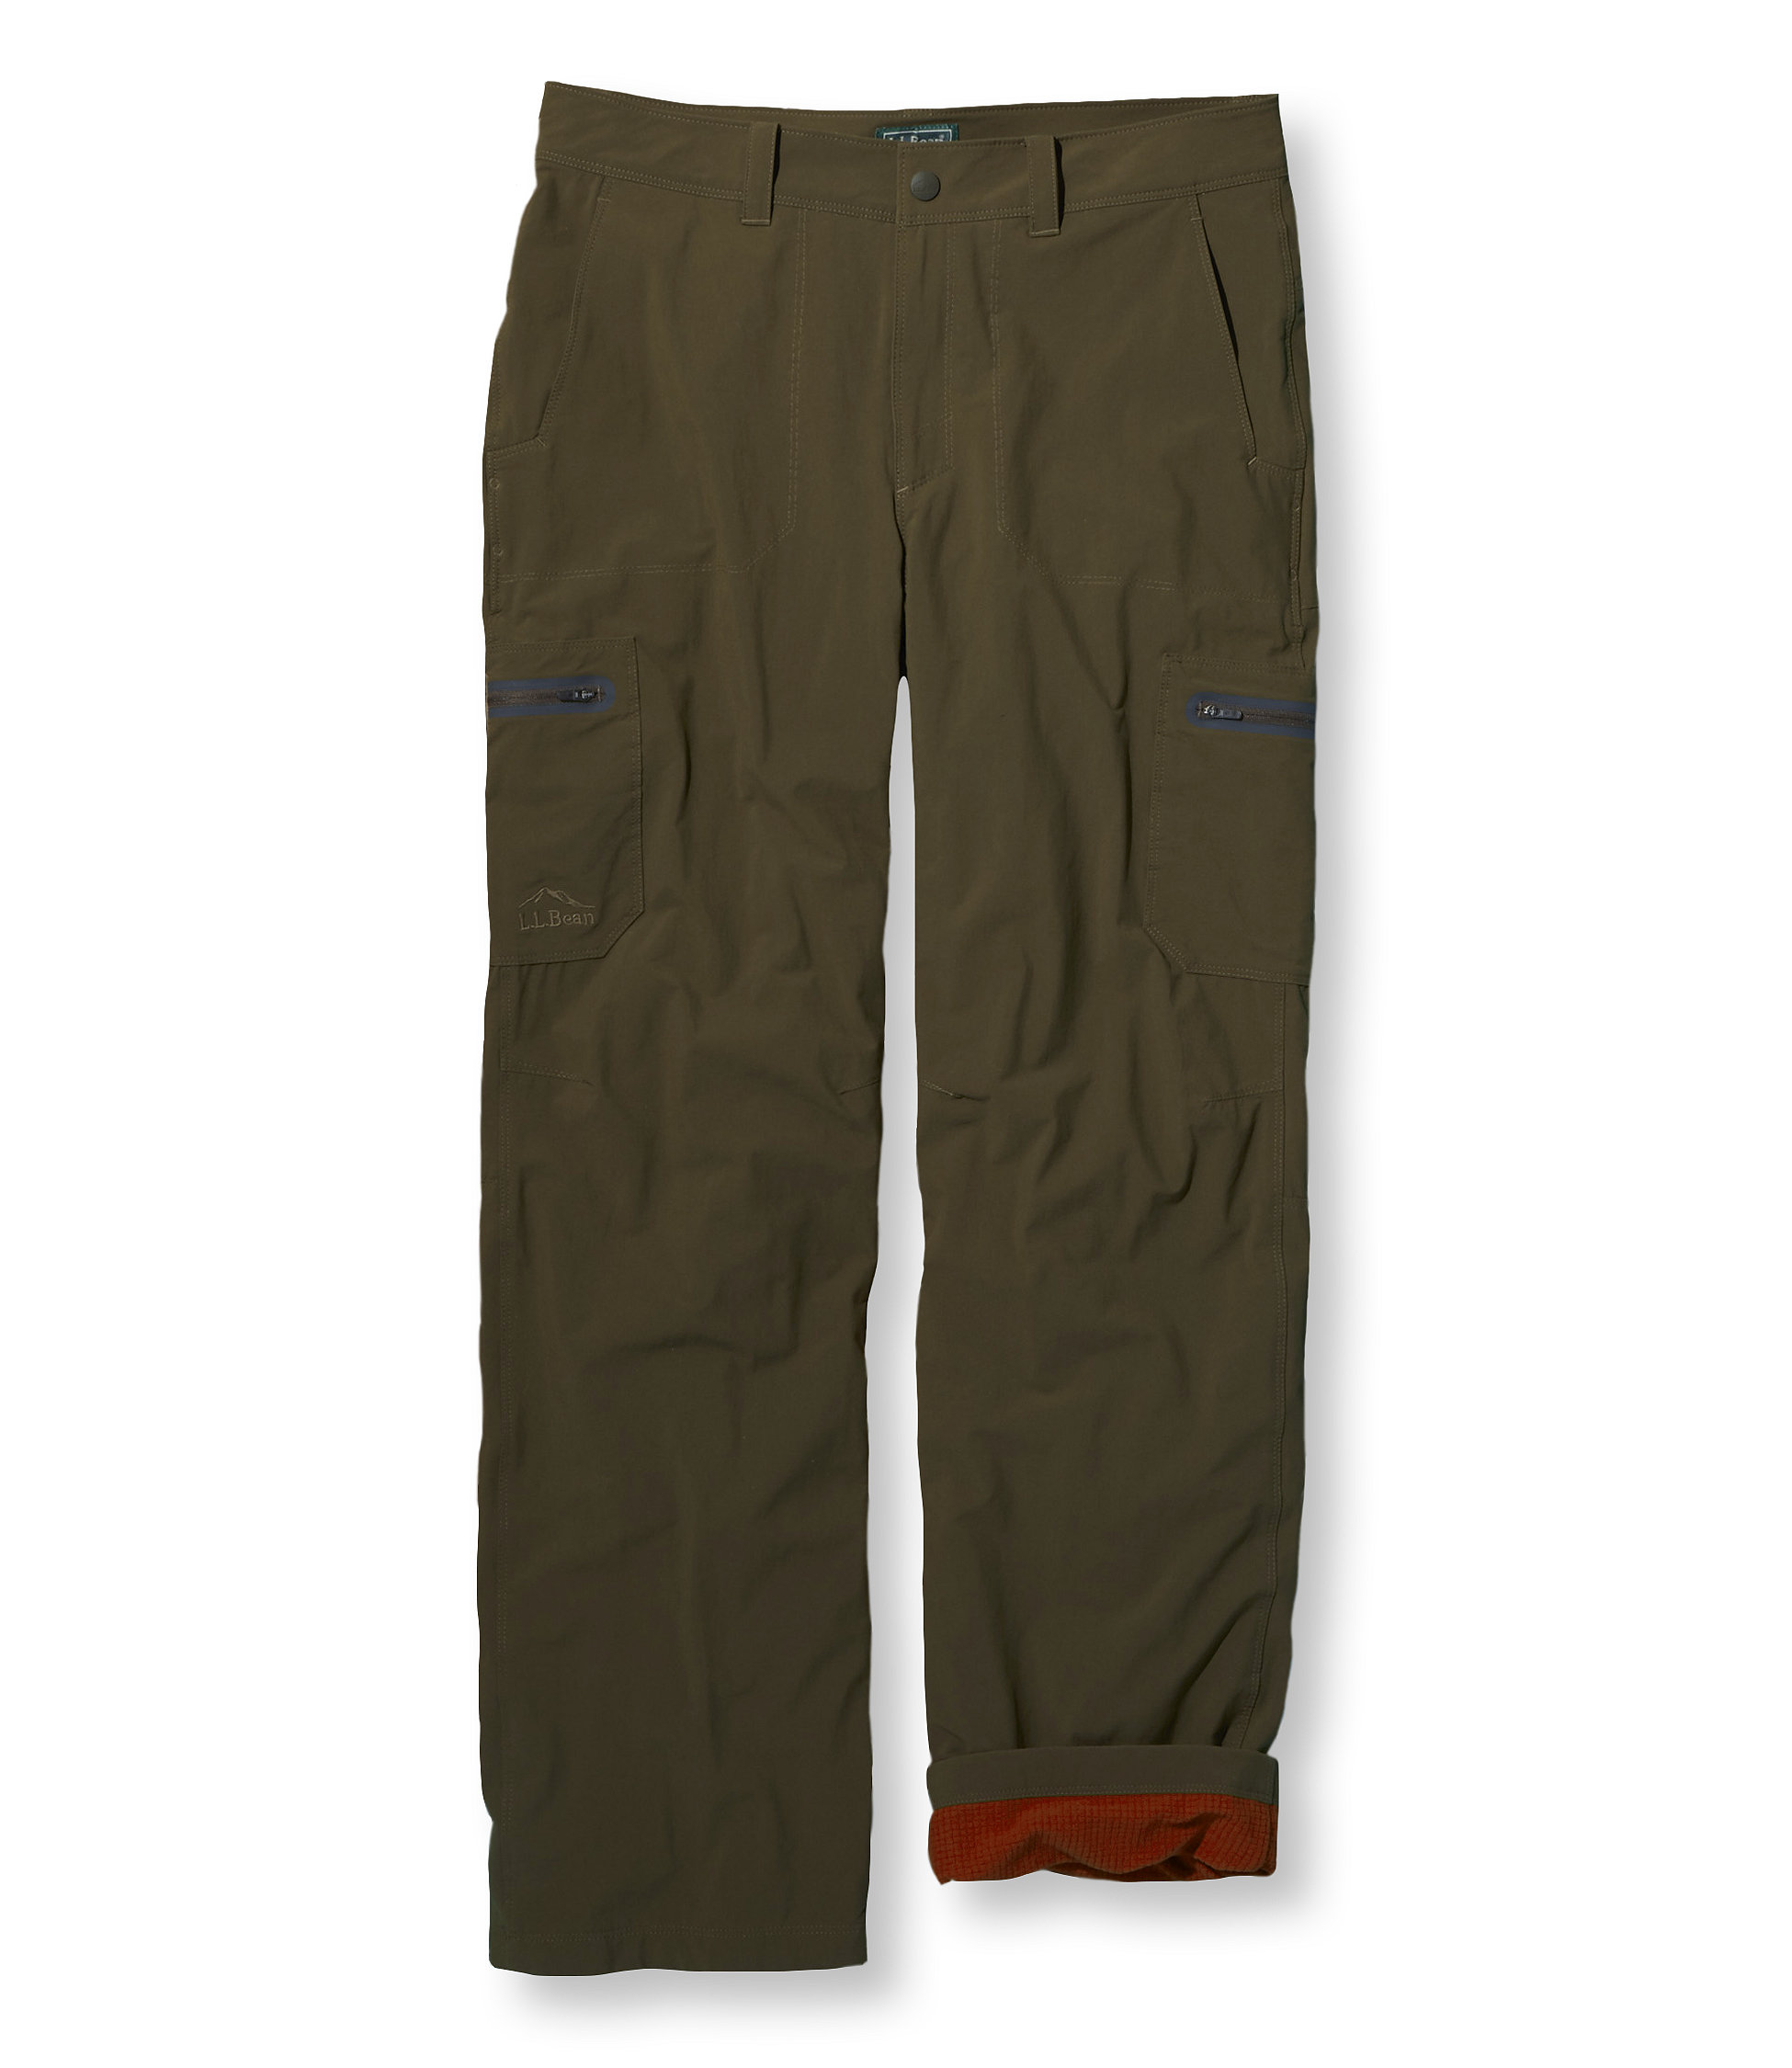 L.L.Bean Cresta Hiking Pants, Lined